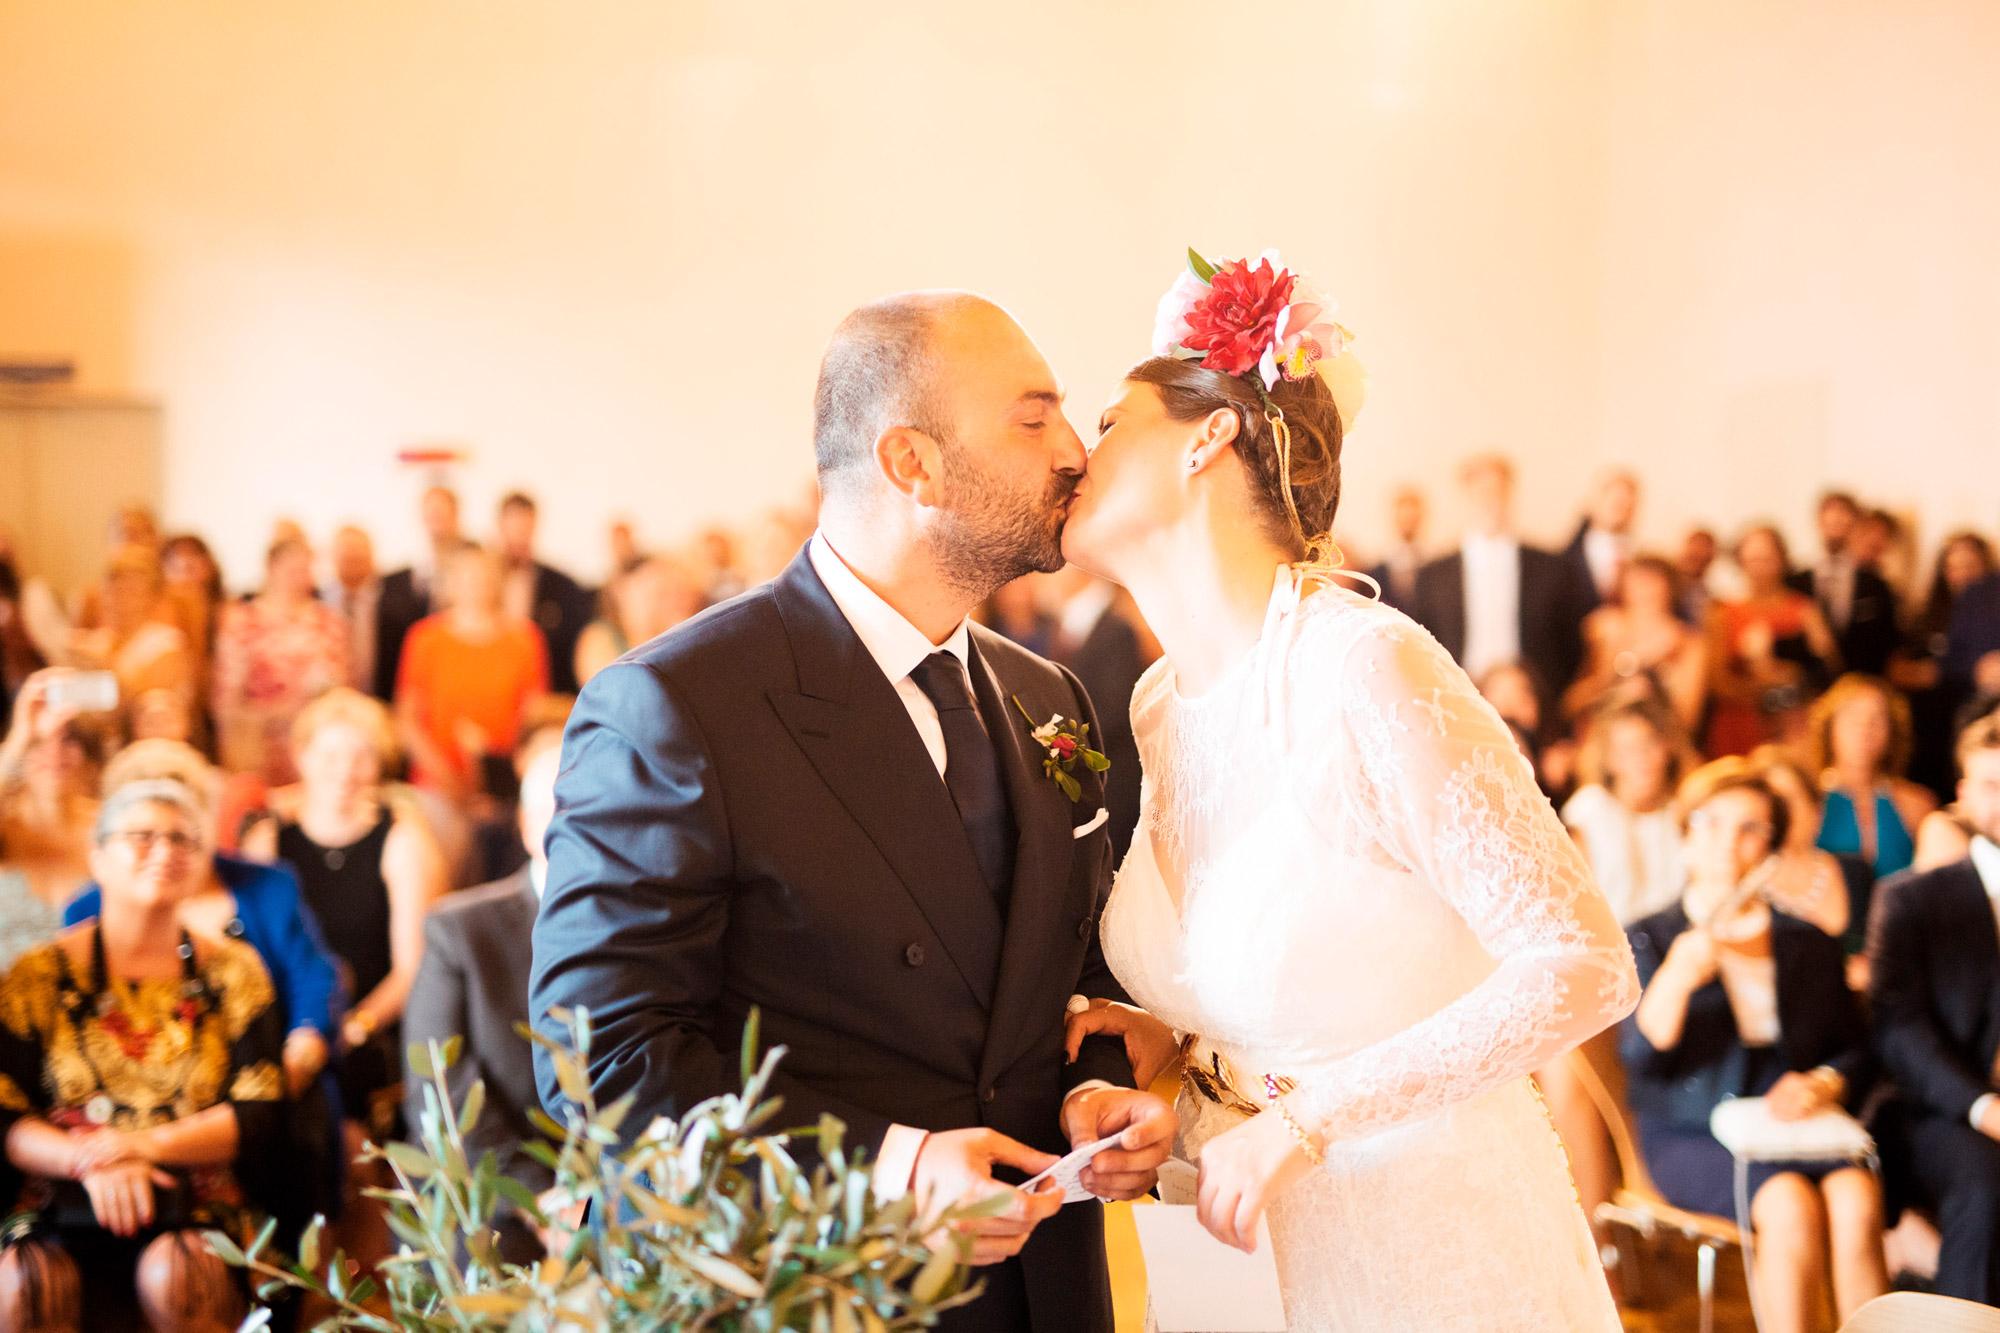 183-FIKUS-PUGLIA-wedding-ostuni-masseria.jpg